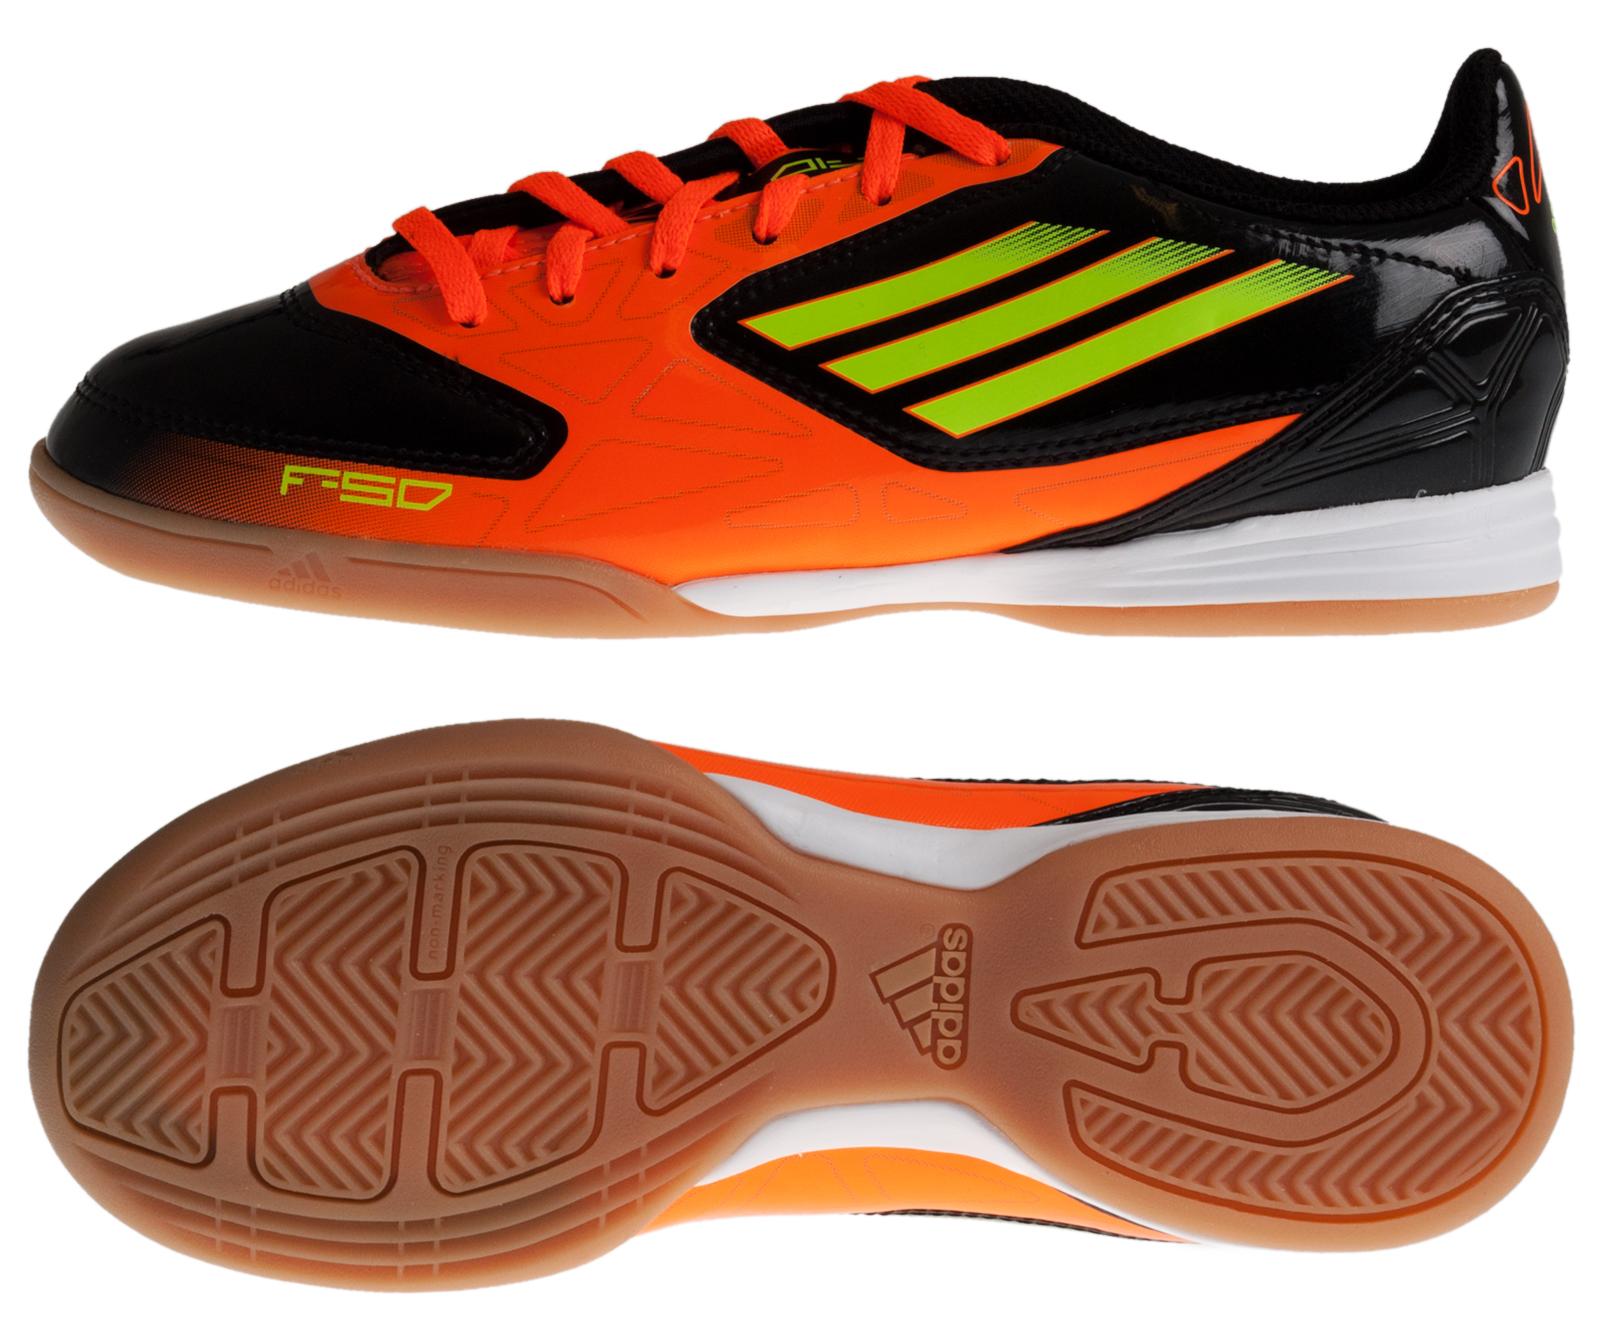 adidas - F10 IN Sort/Orange Børn